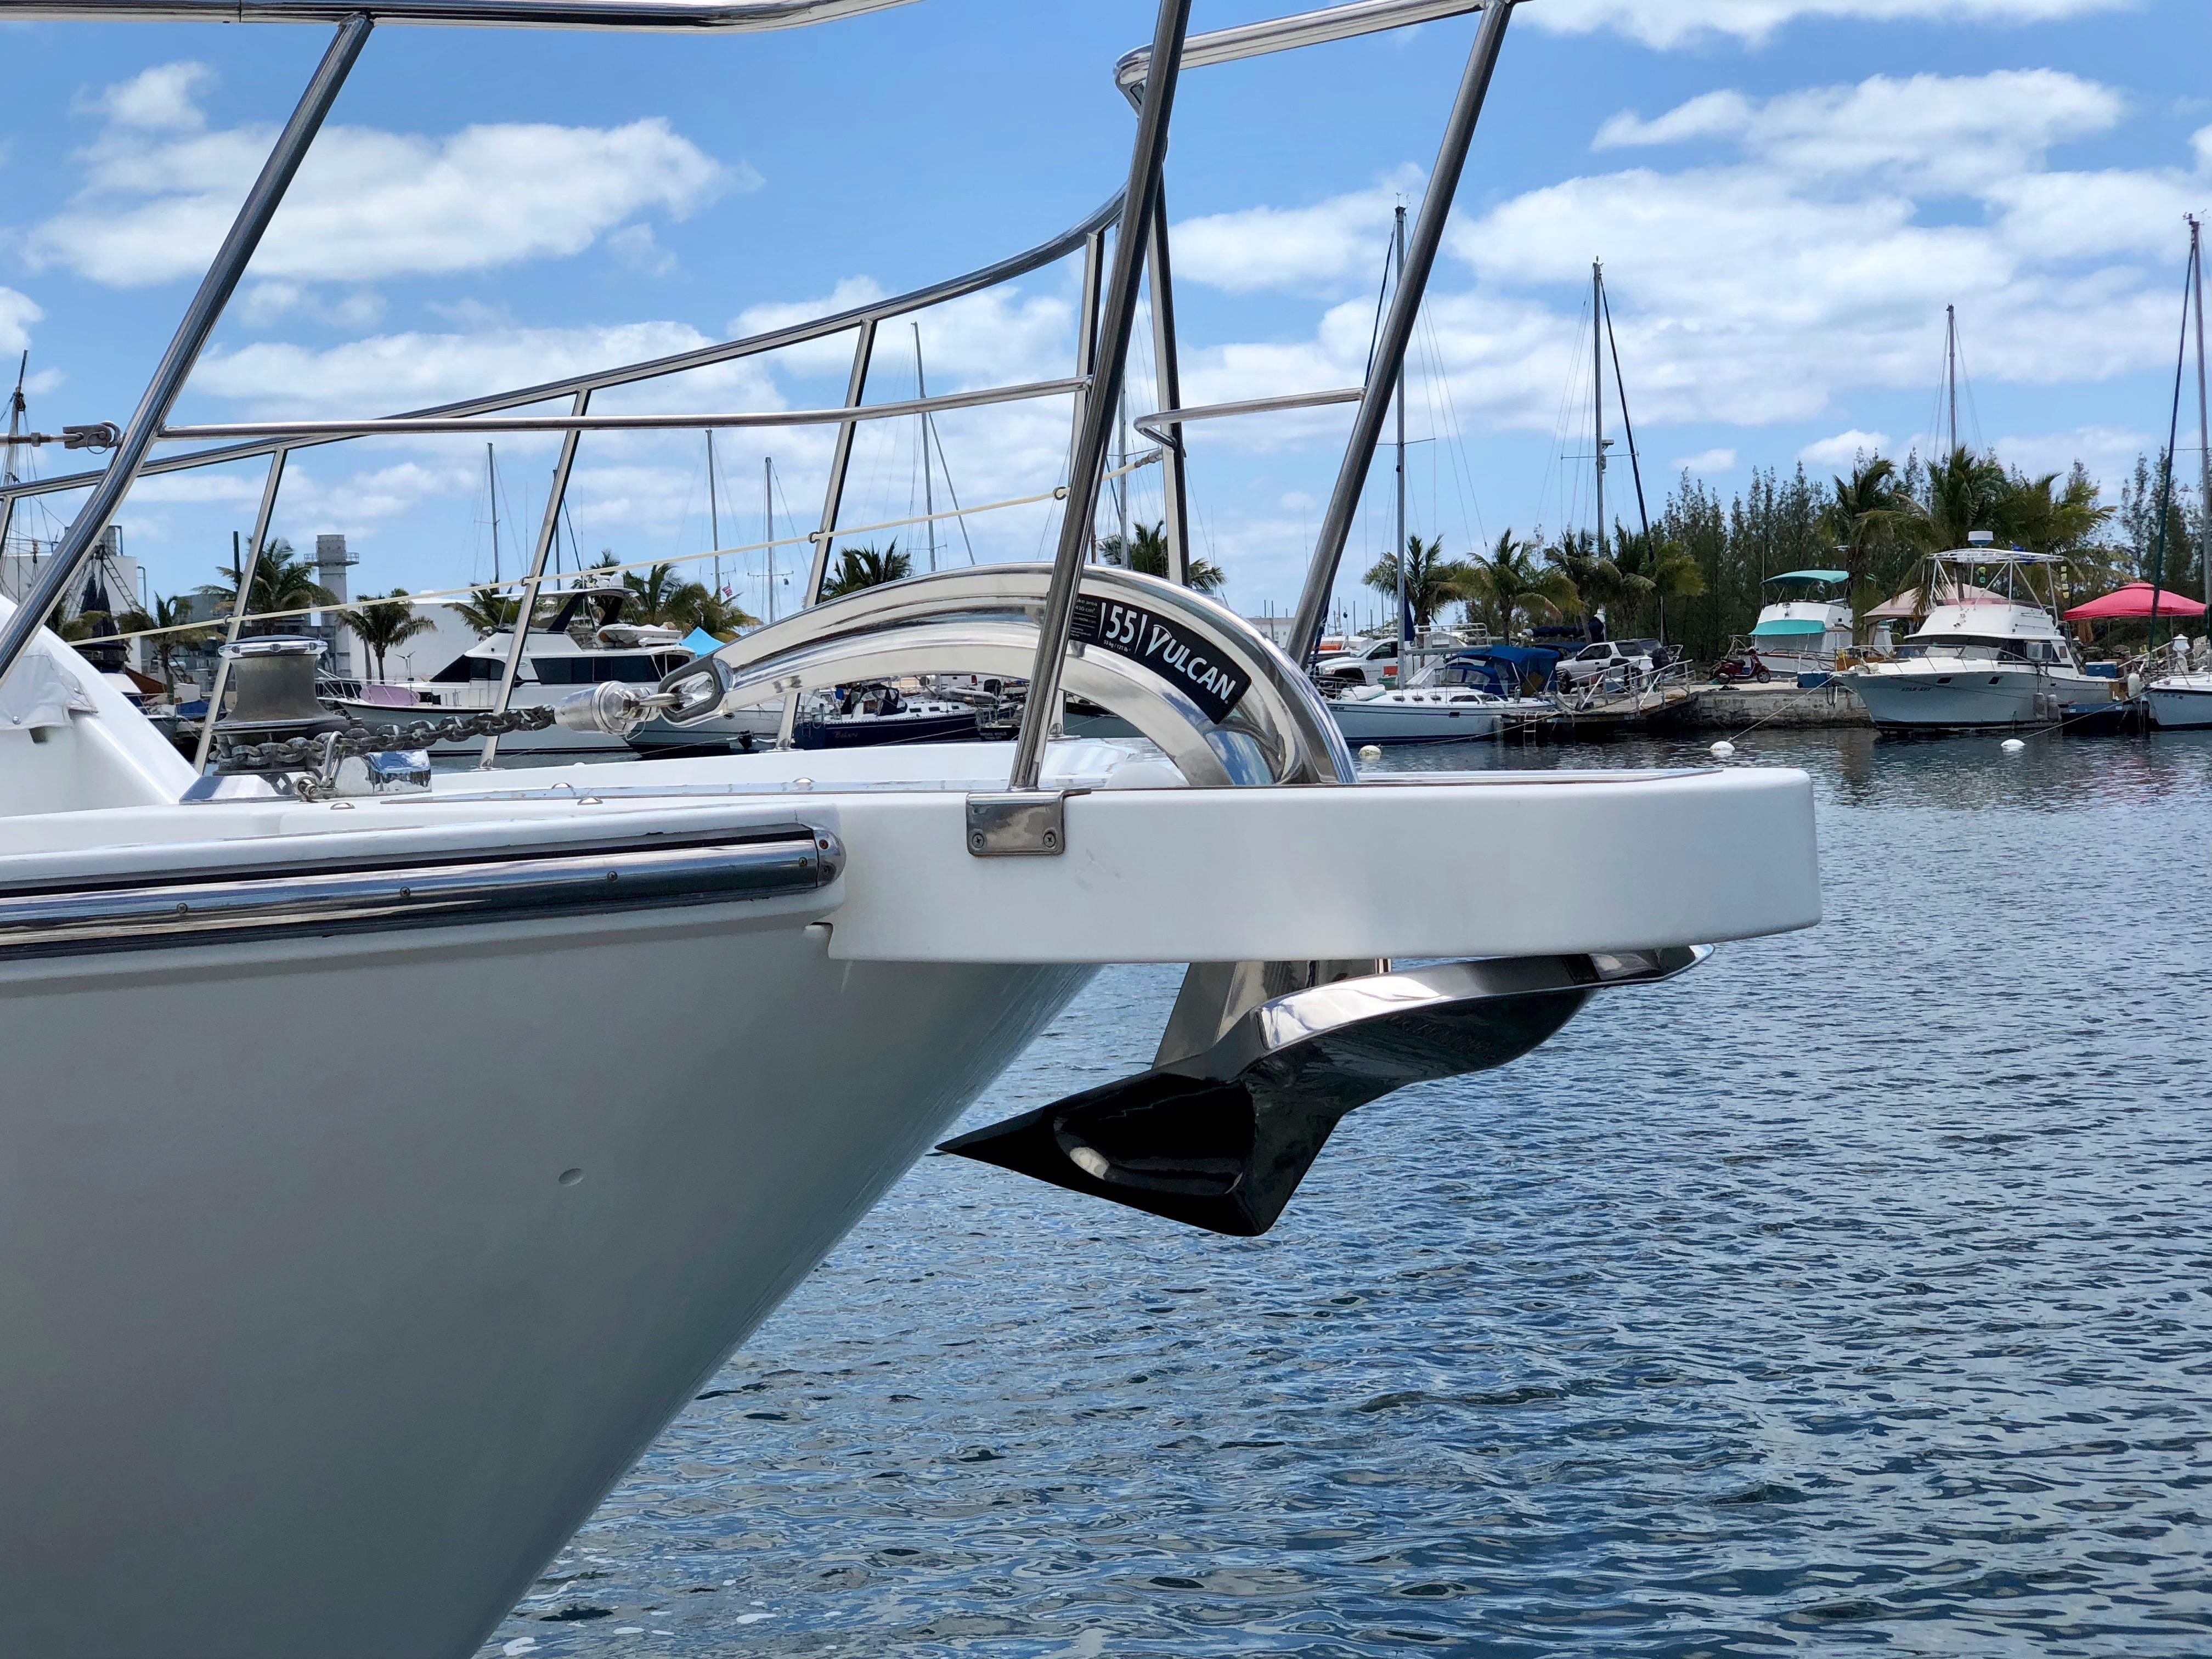 OLOH's New Anchor: Vulcan On Board